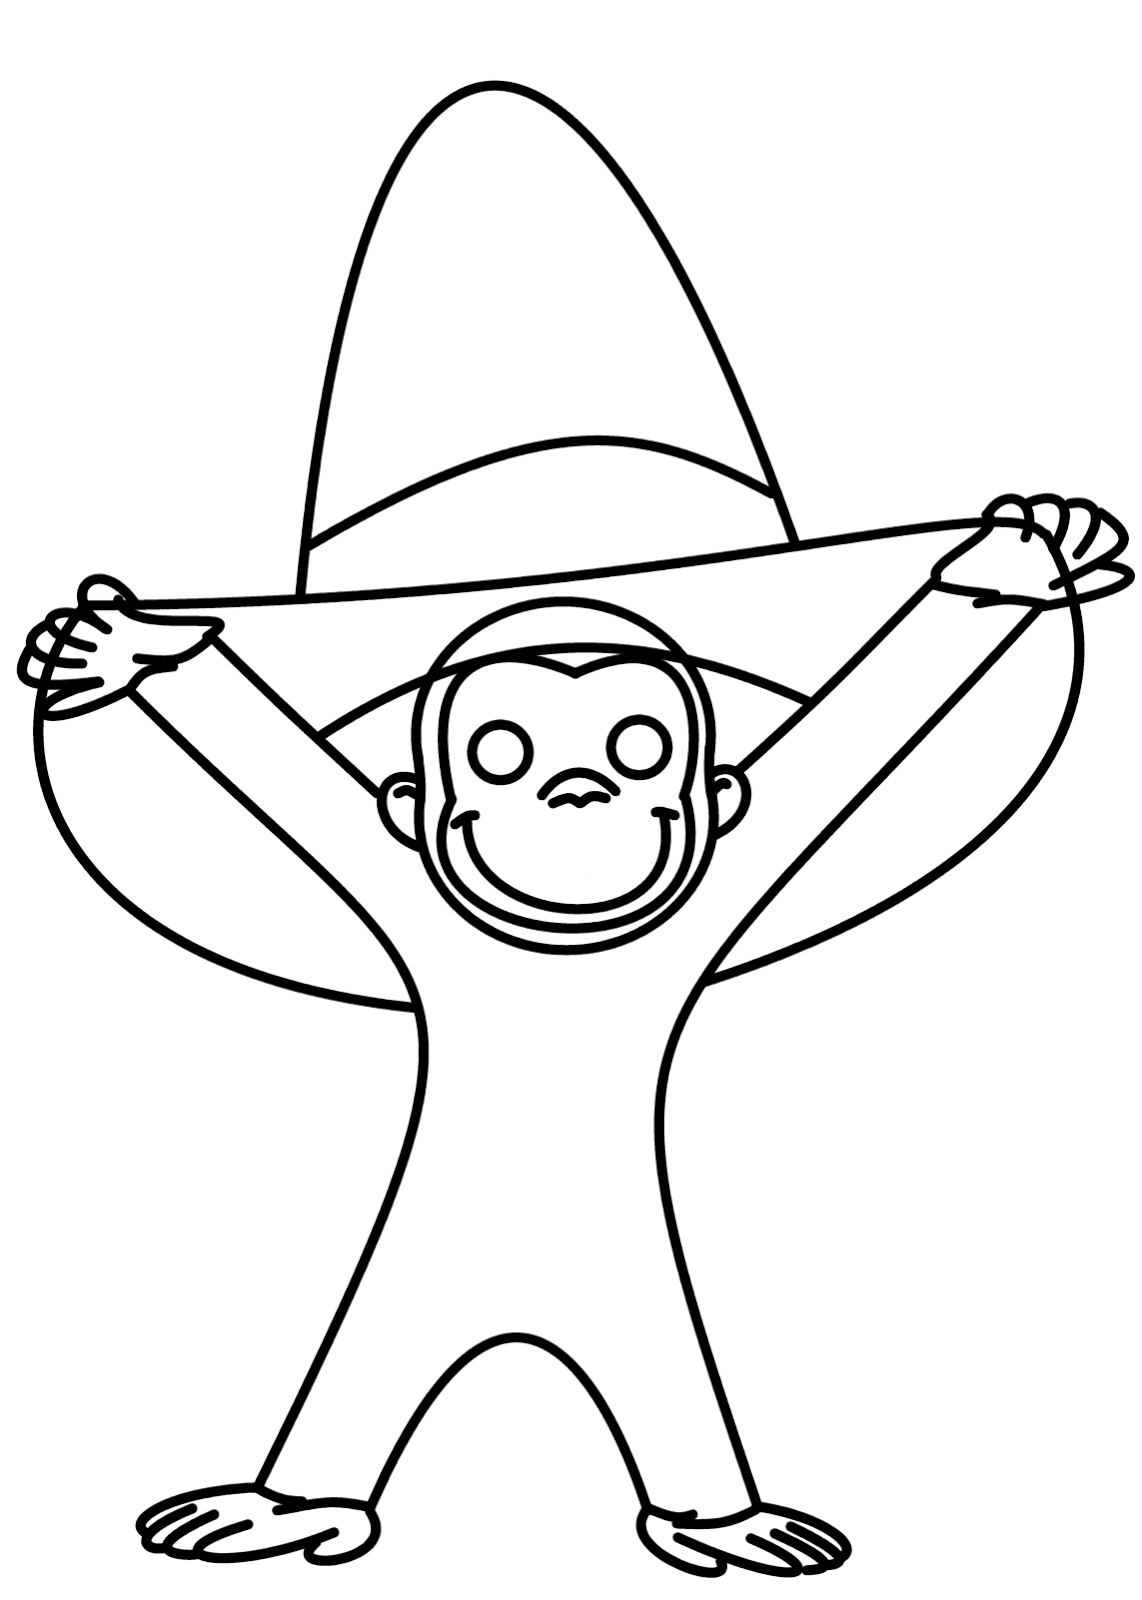 1142x1600 How To Draw Cartoons Curious George